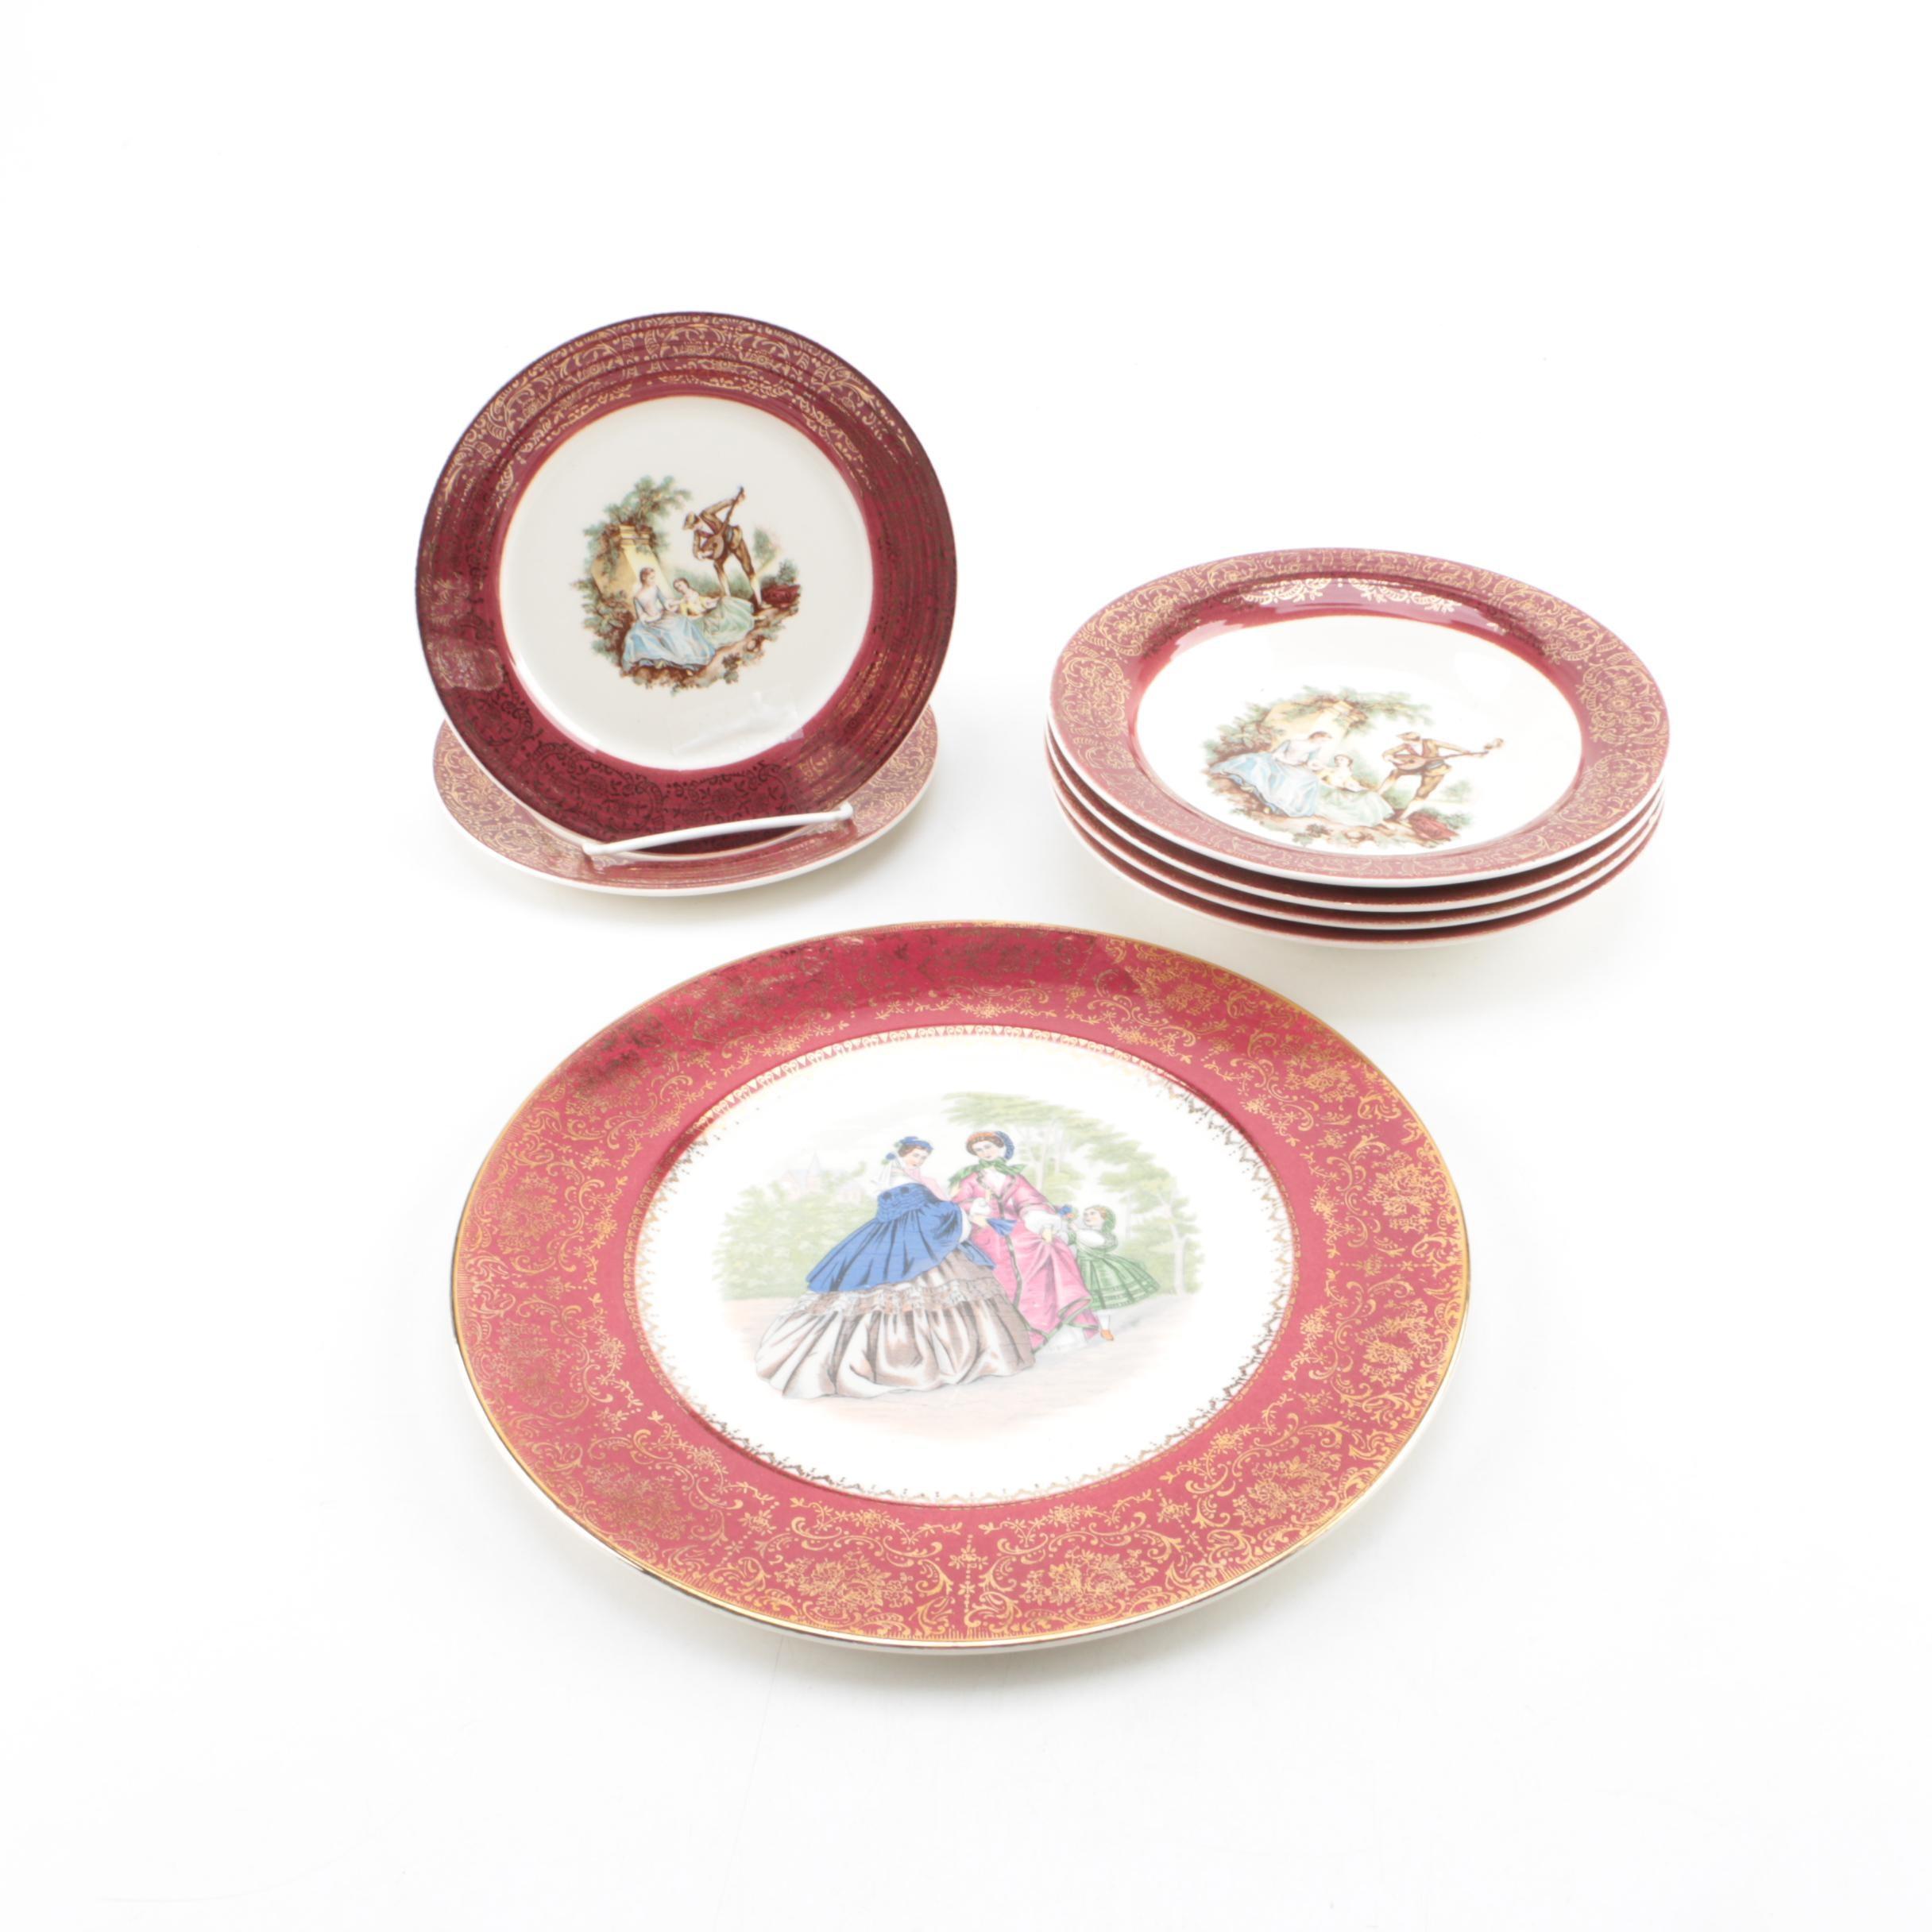 "Sebring Pottery Co. ""Serenade"" Tableware"